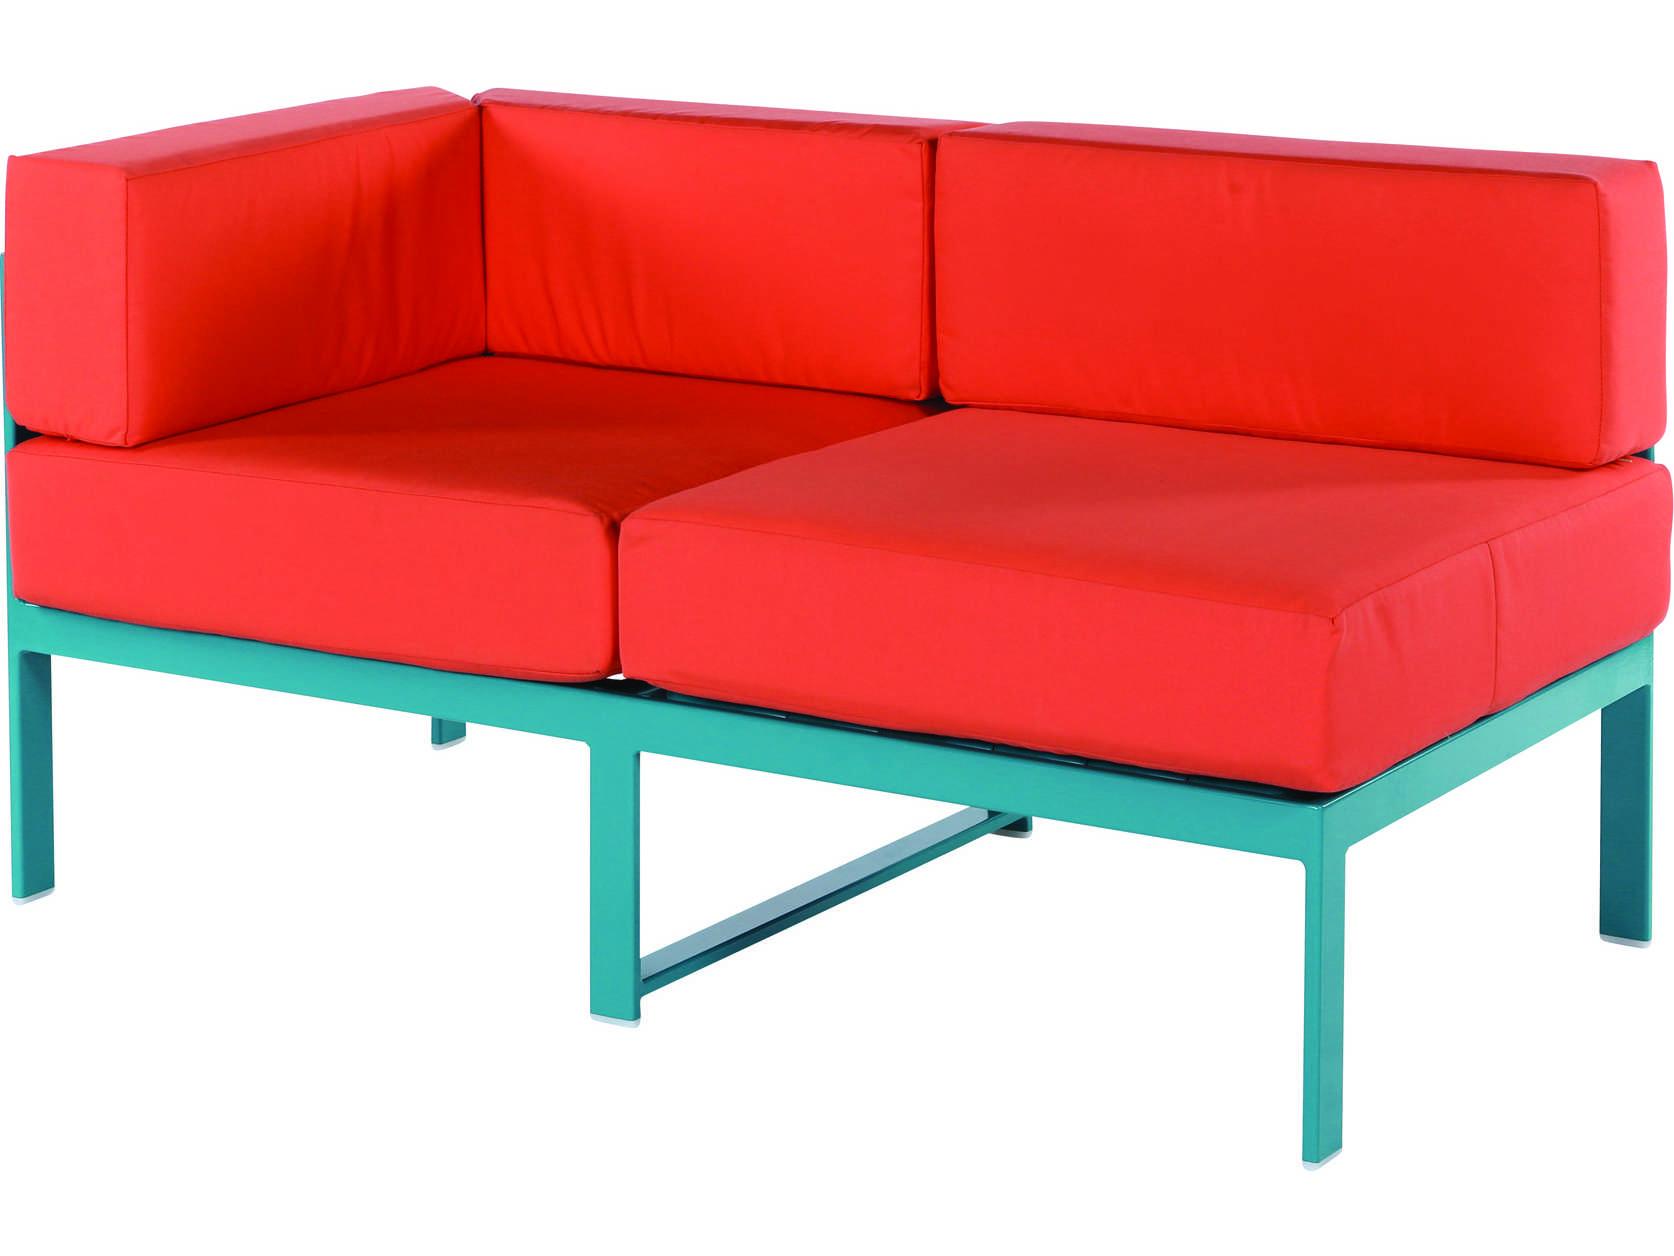 windward design group south beach modular aluminum lounge set southbchmdrlngset3. Black Bedroom Furniture Sets. Home Design Ideas